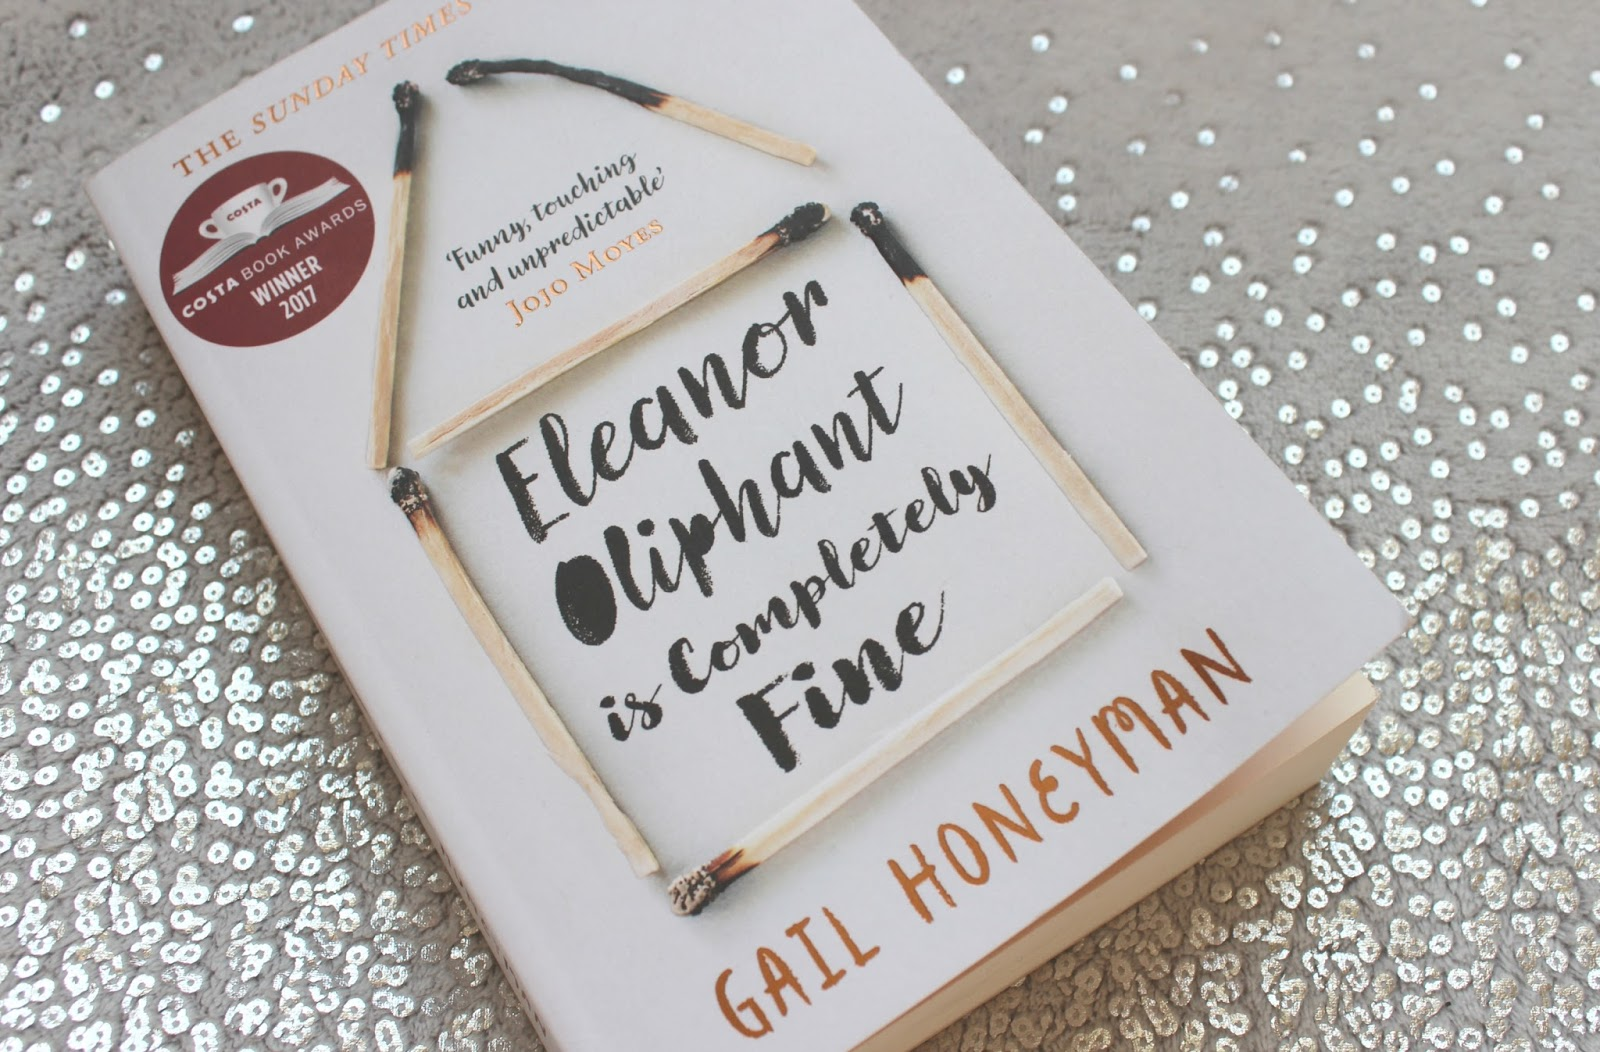 8 Books Like Eleanor Oliphant is Completely Fine